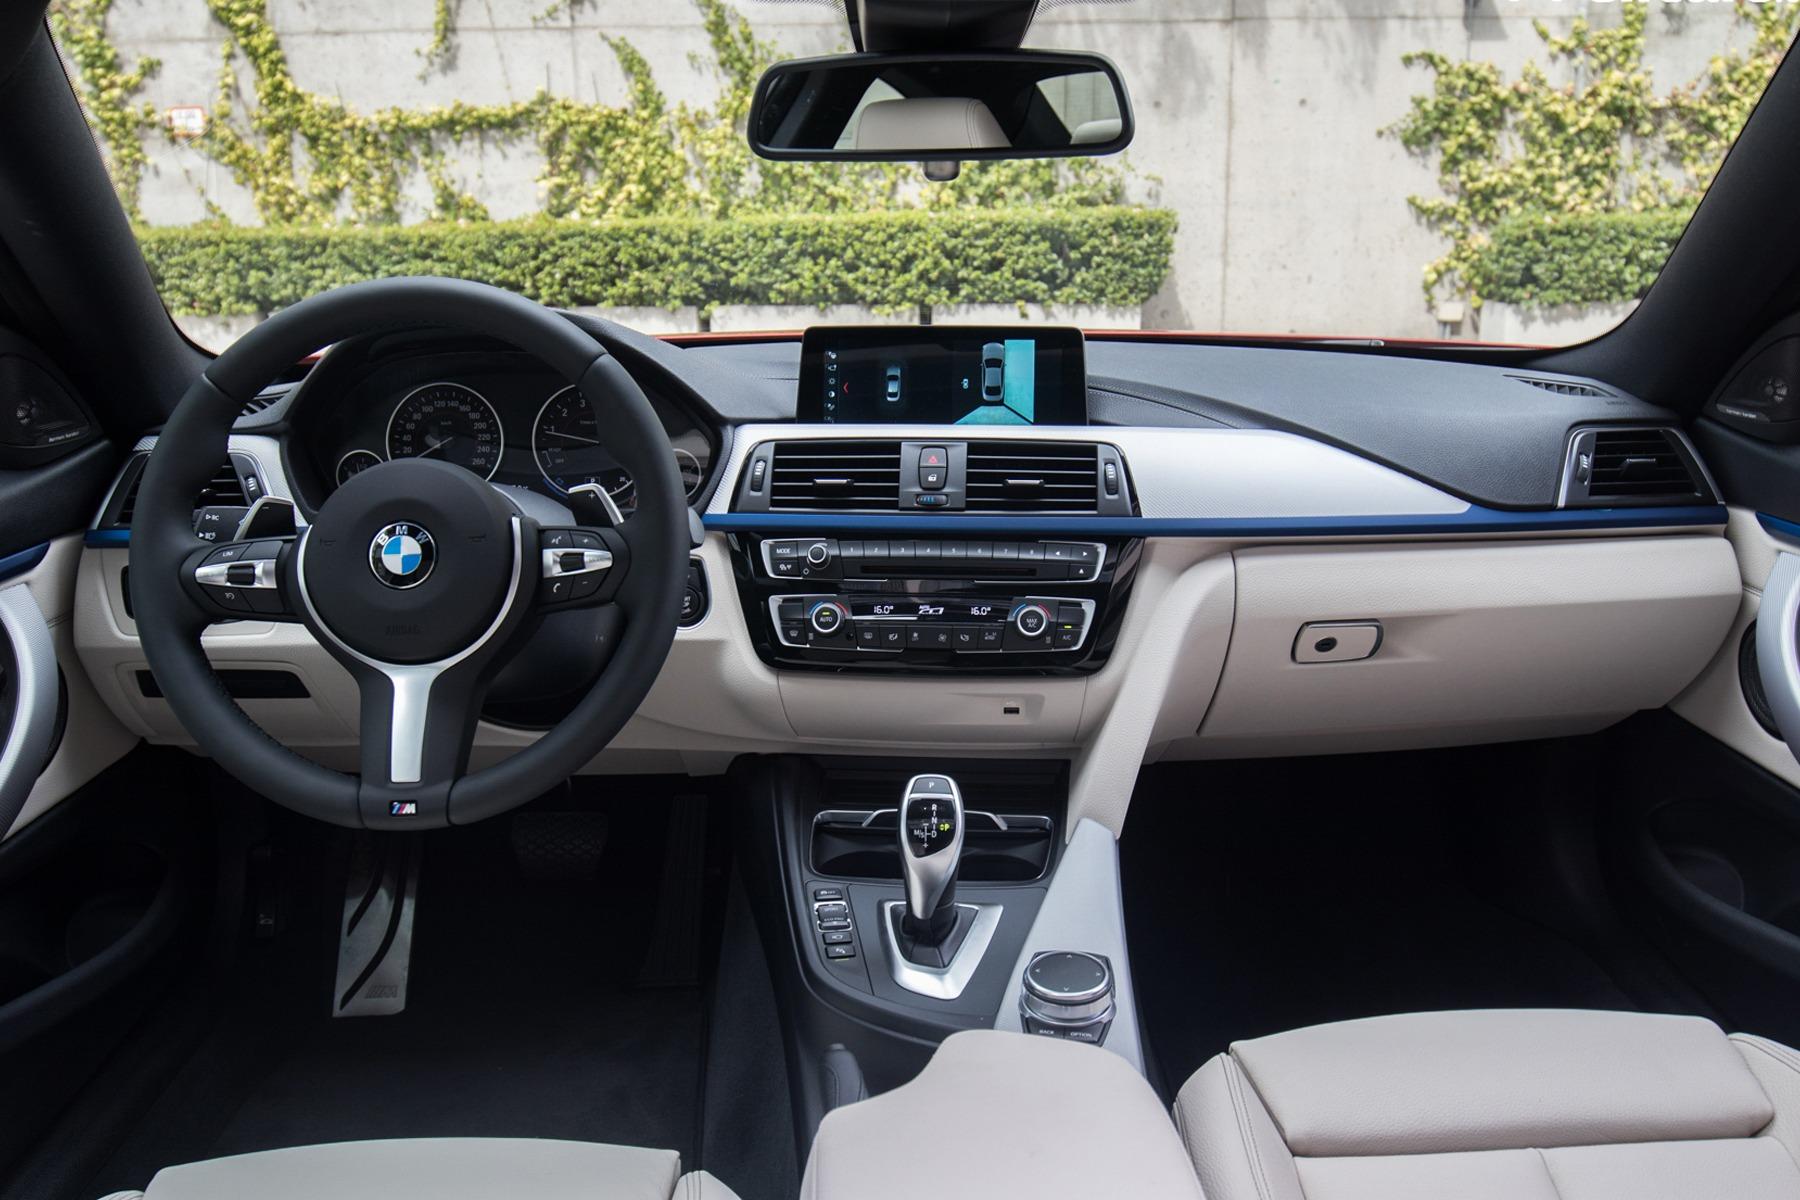 comprar coche por internet fiable